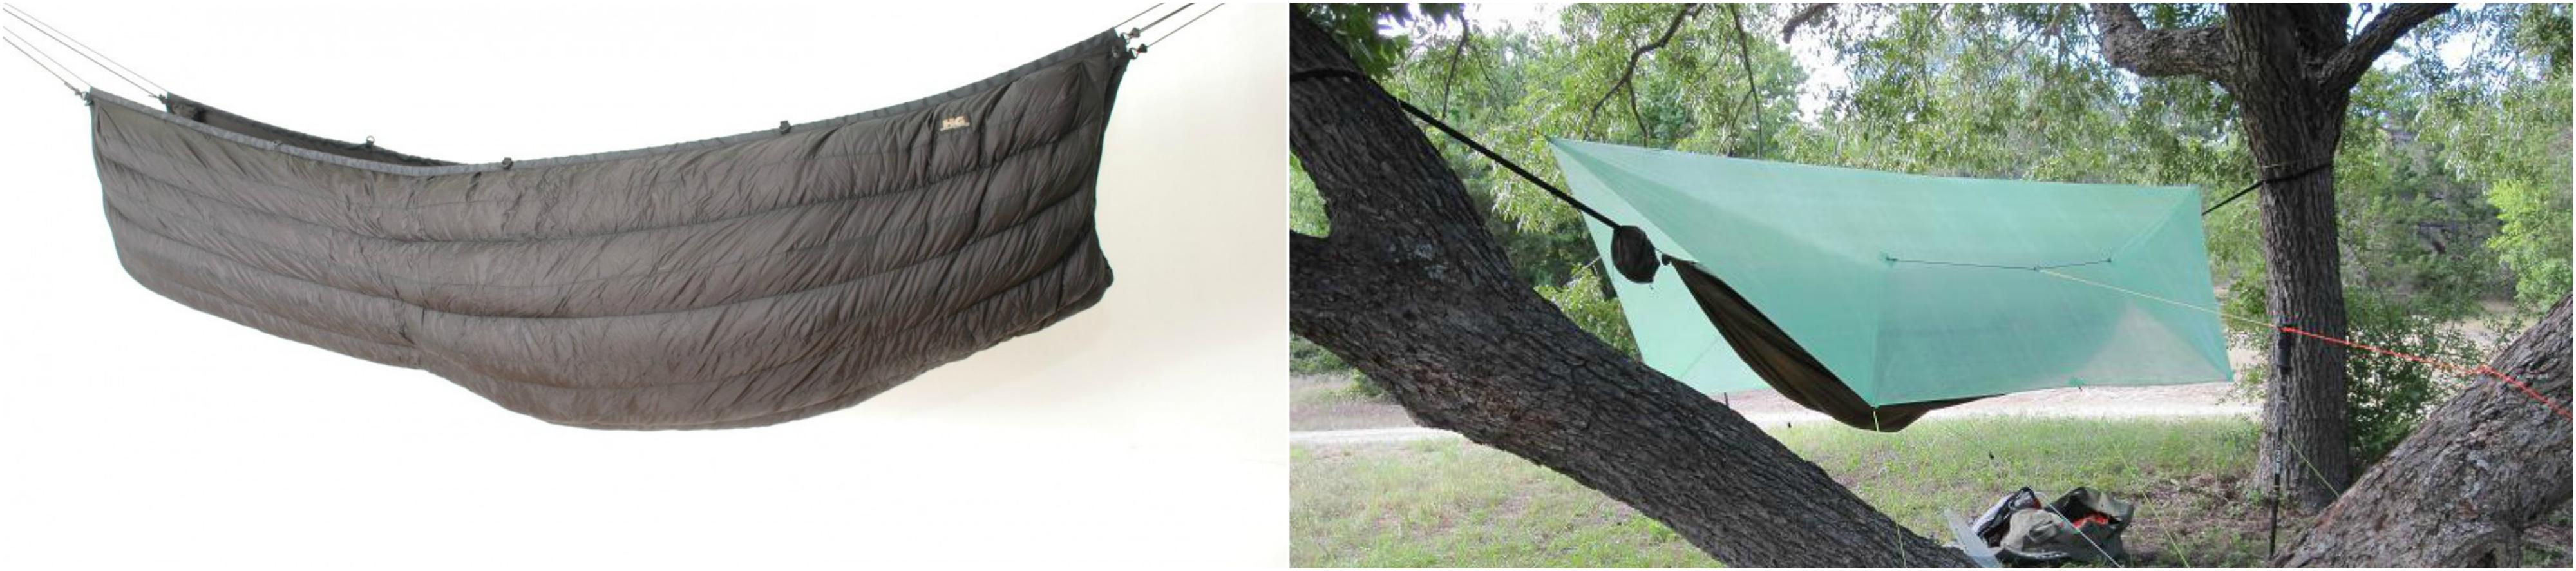 hammock-new